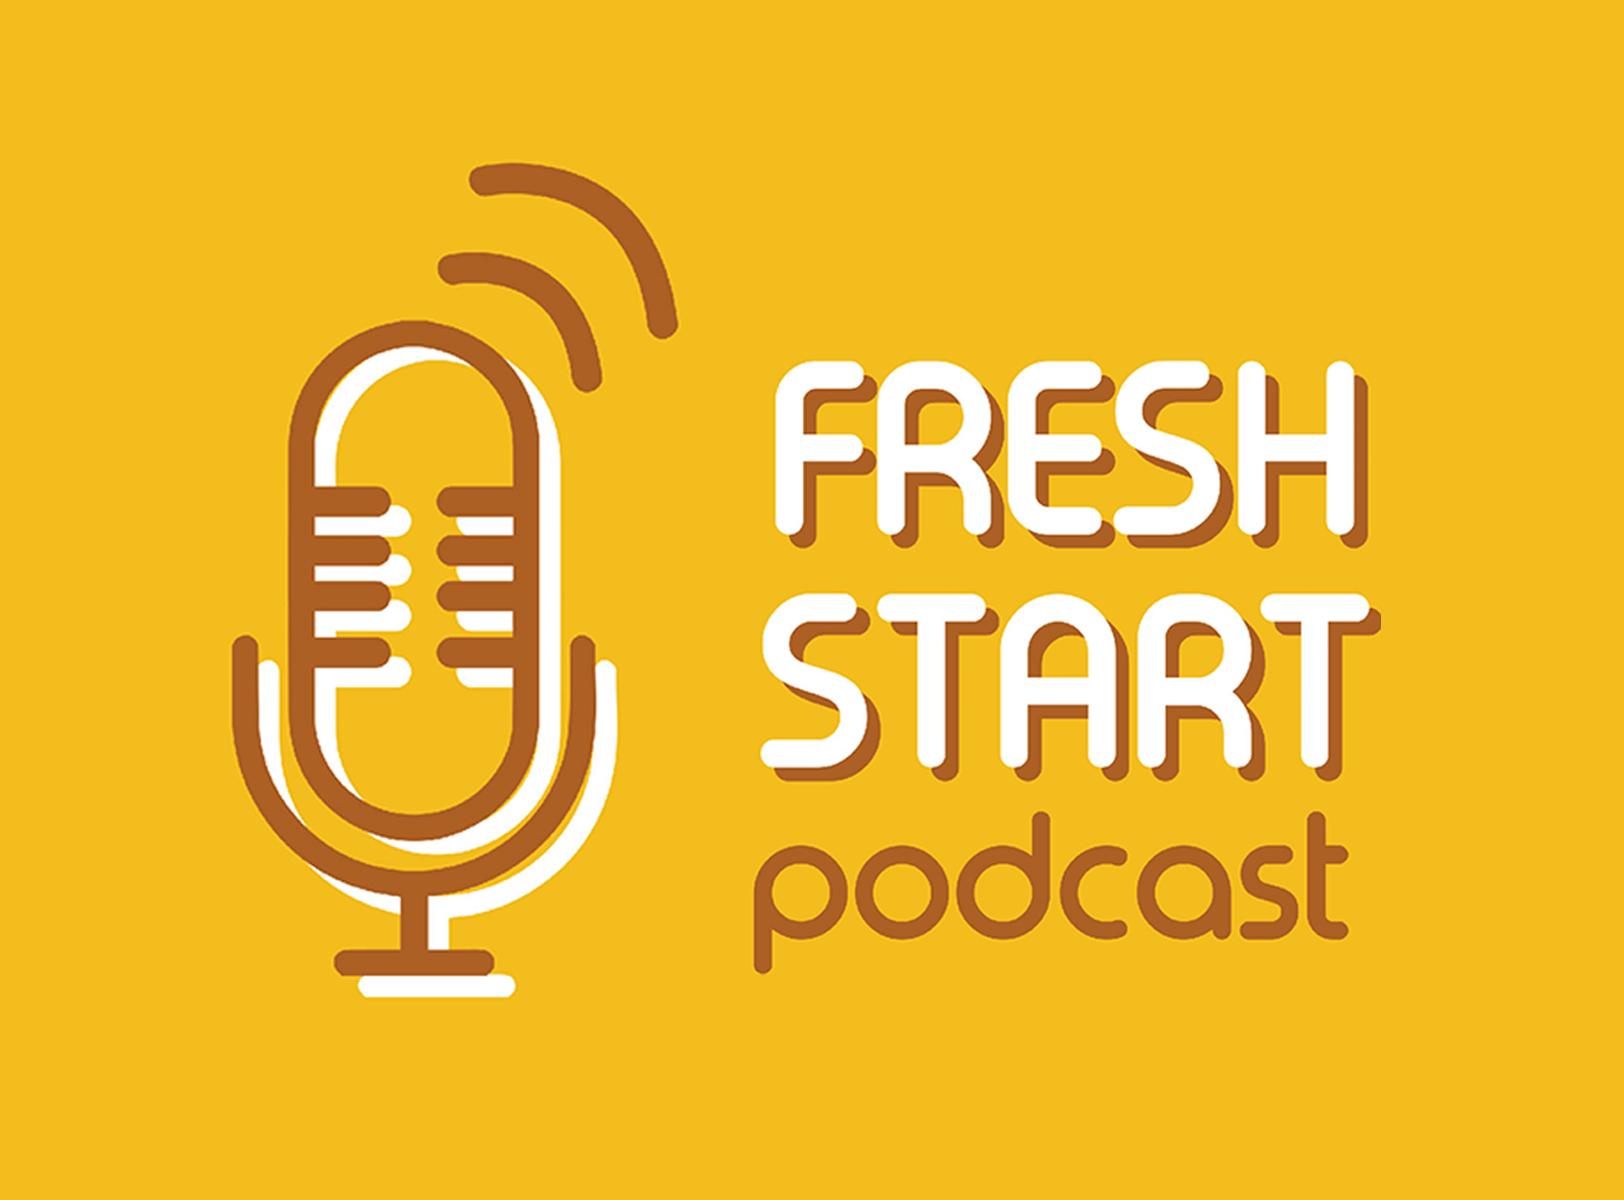 Fresh Start: Podcast News (1/9/2019 Wed.)